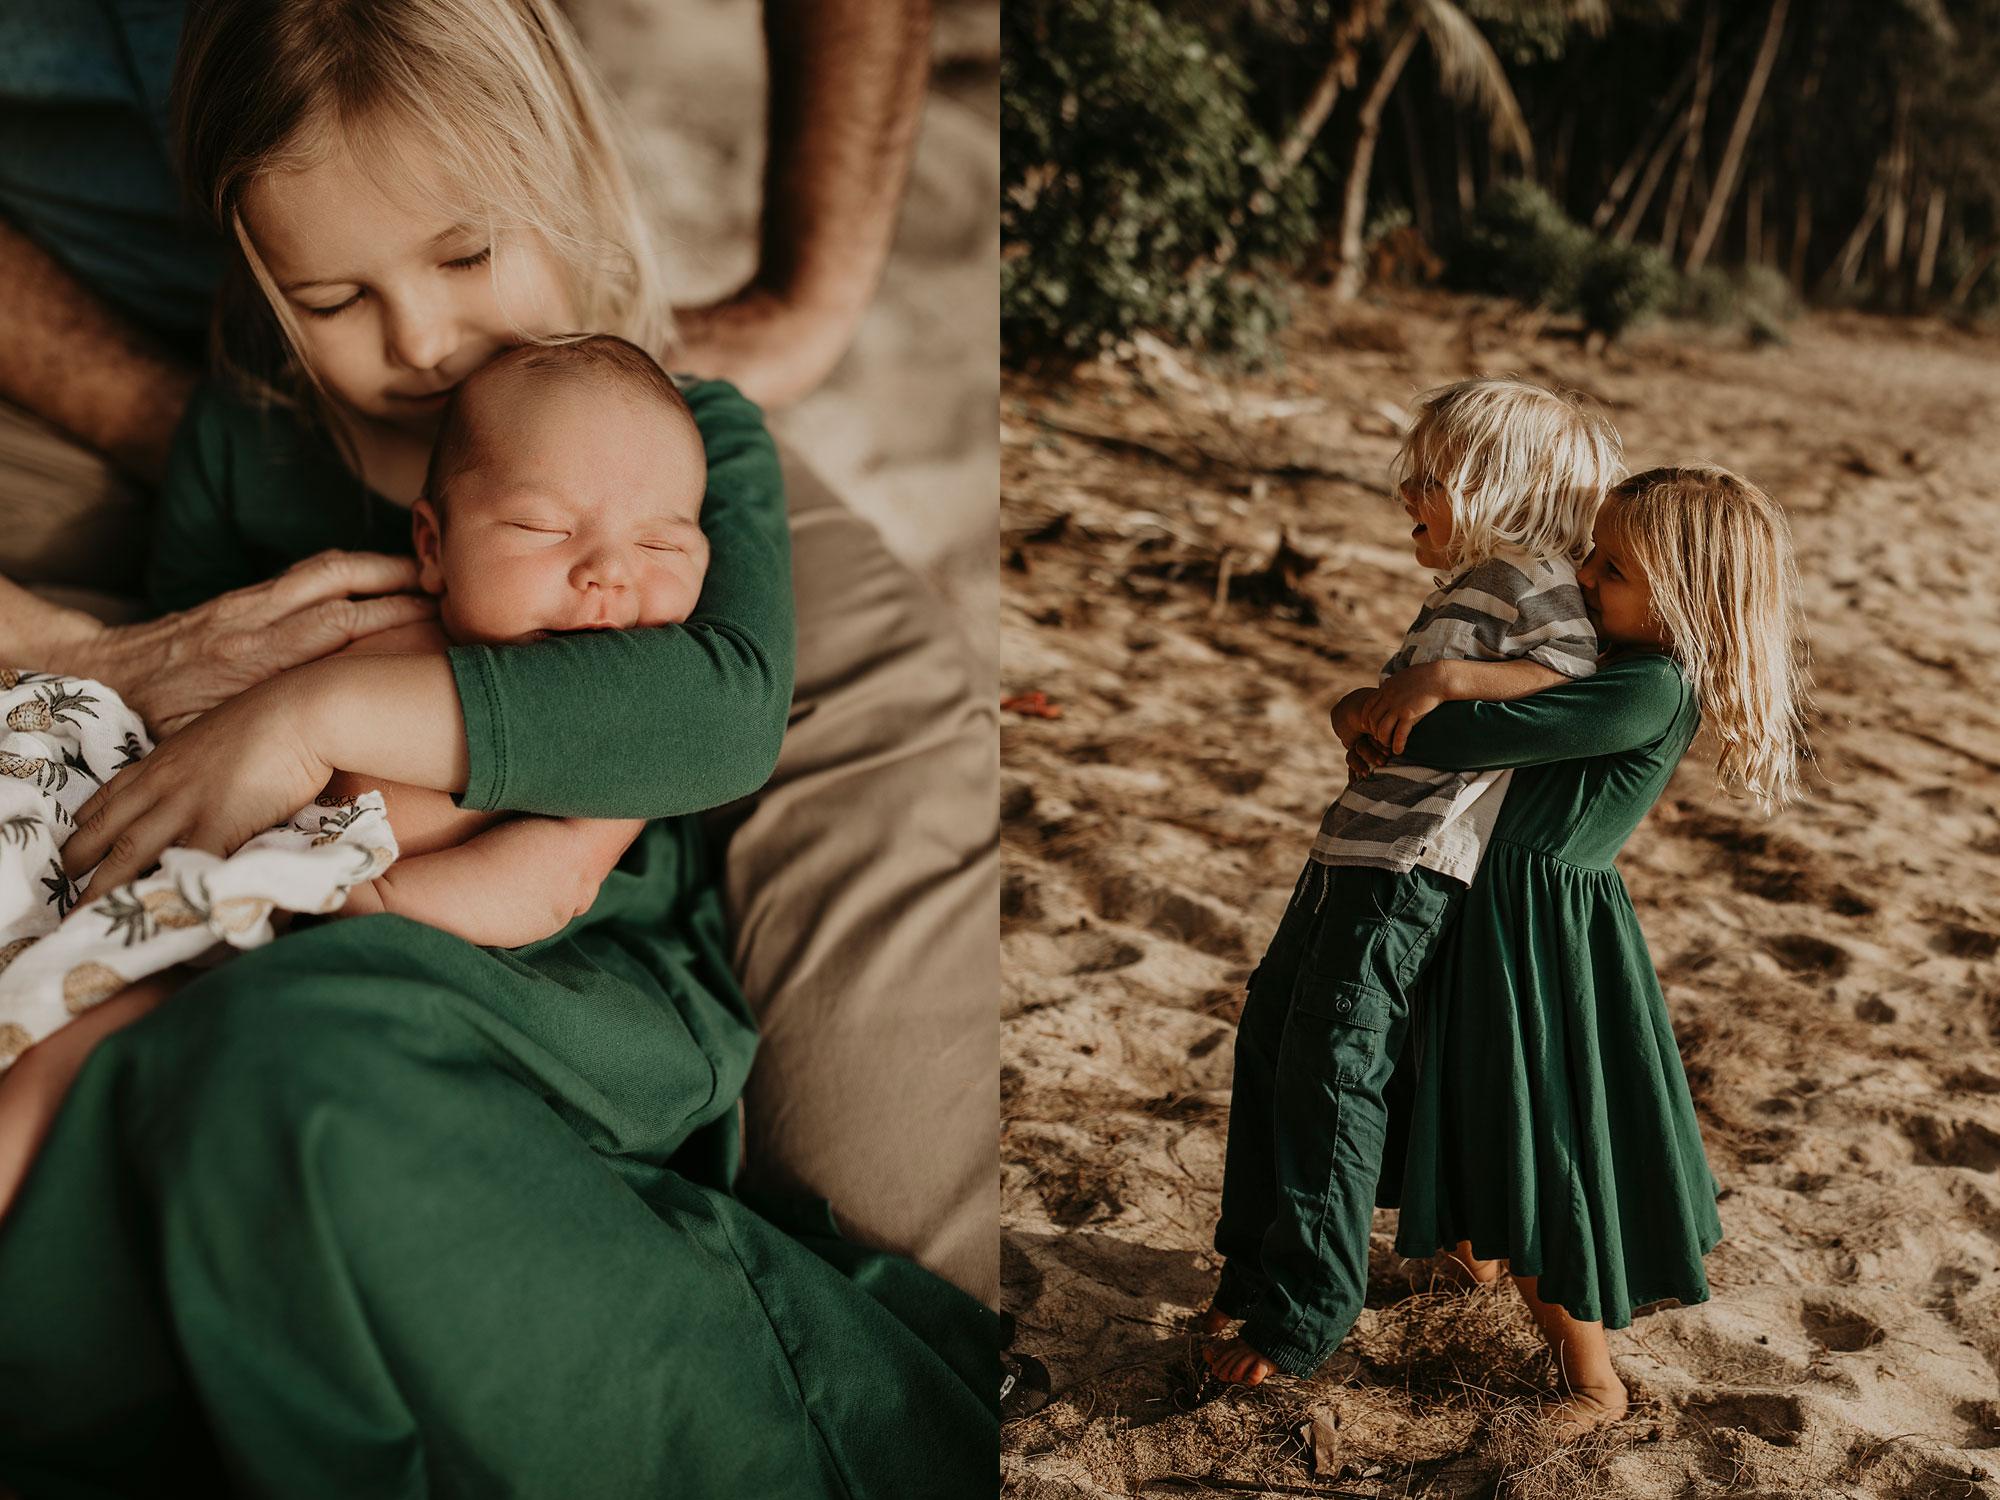 Hawaii-Outdoor-Newborn-Photography-03.jpg